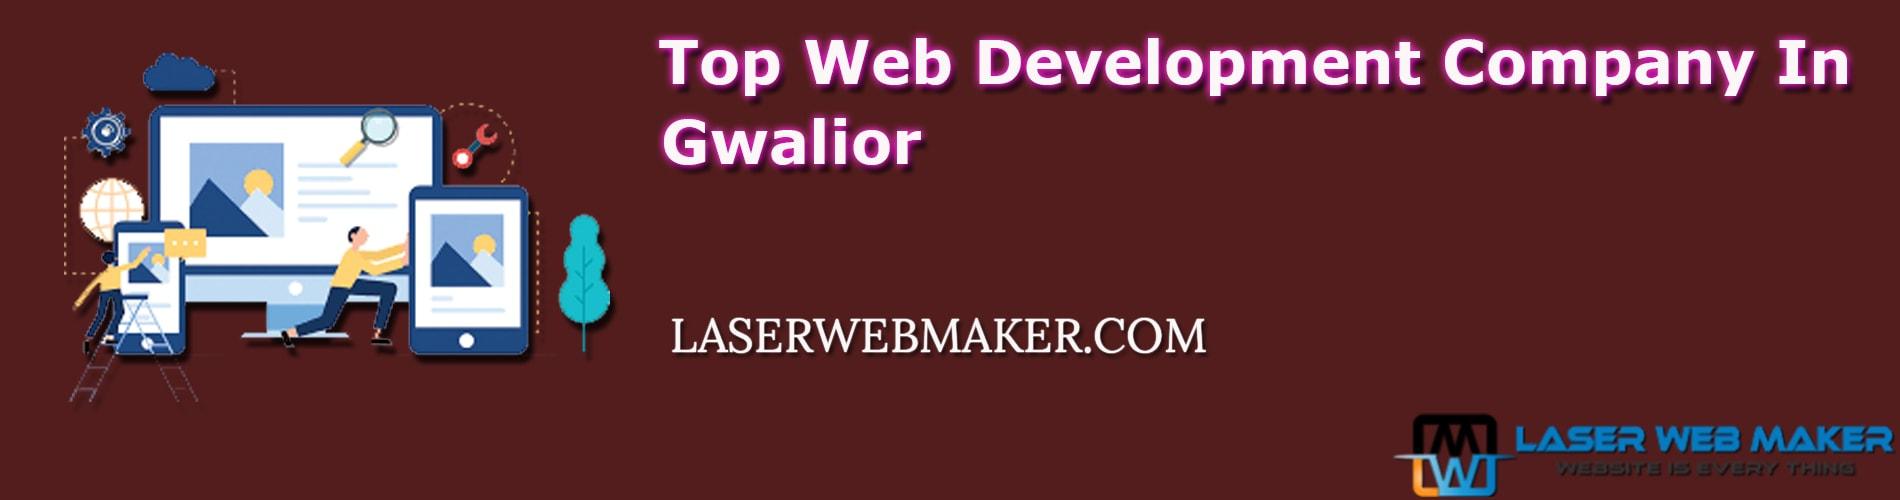 Top Web Development Company In Gwalior